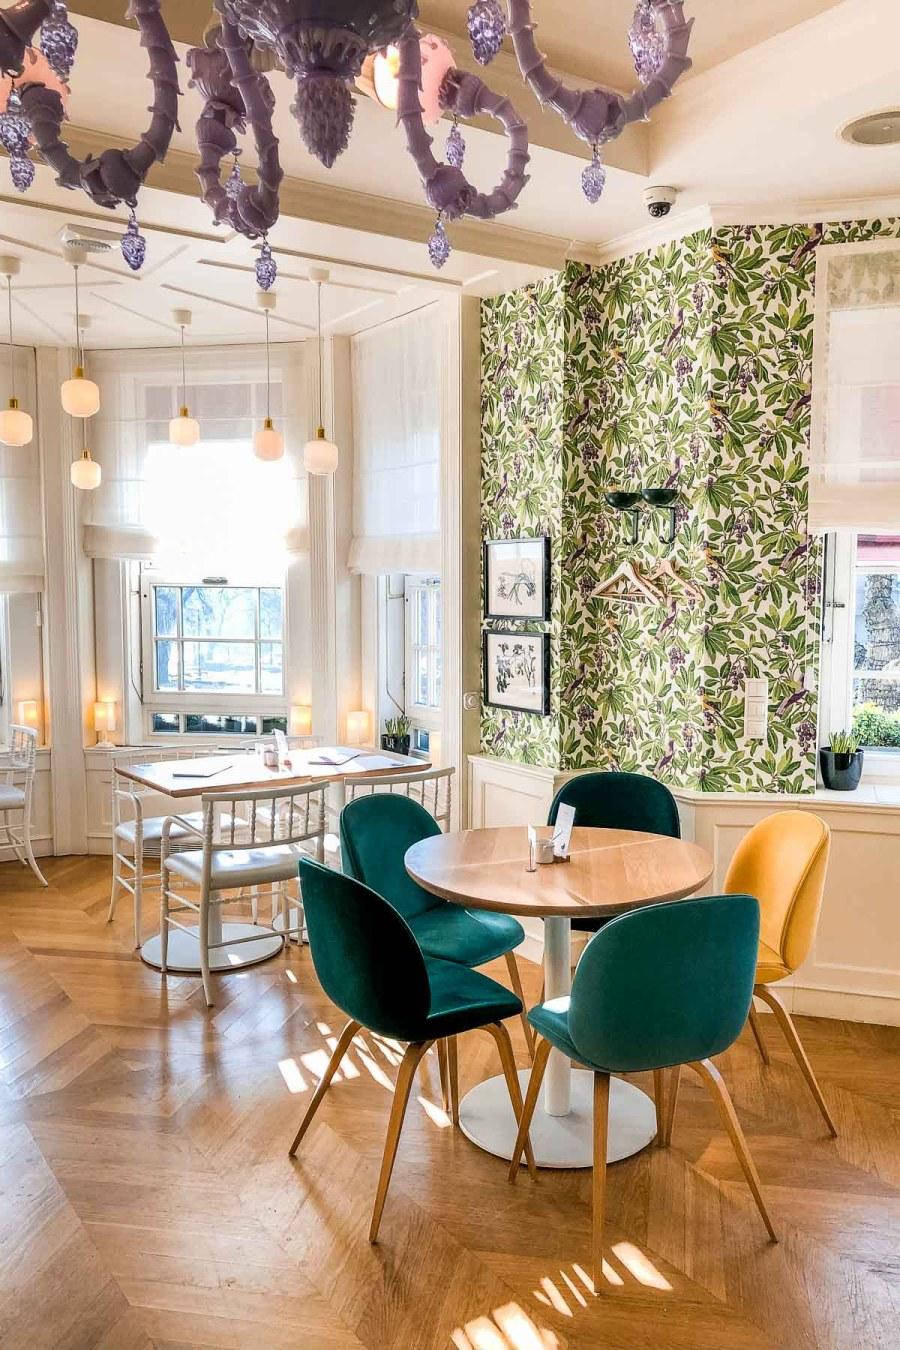 Beautiful interior at Villa Bagatella in Budapest, Hungary